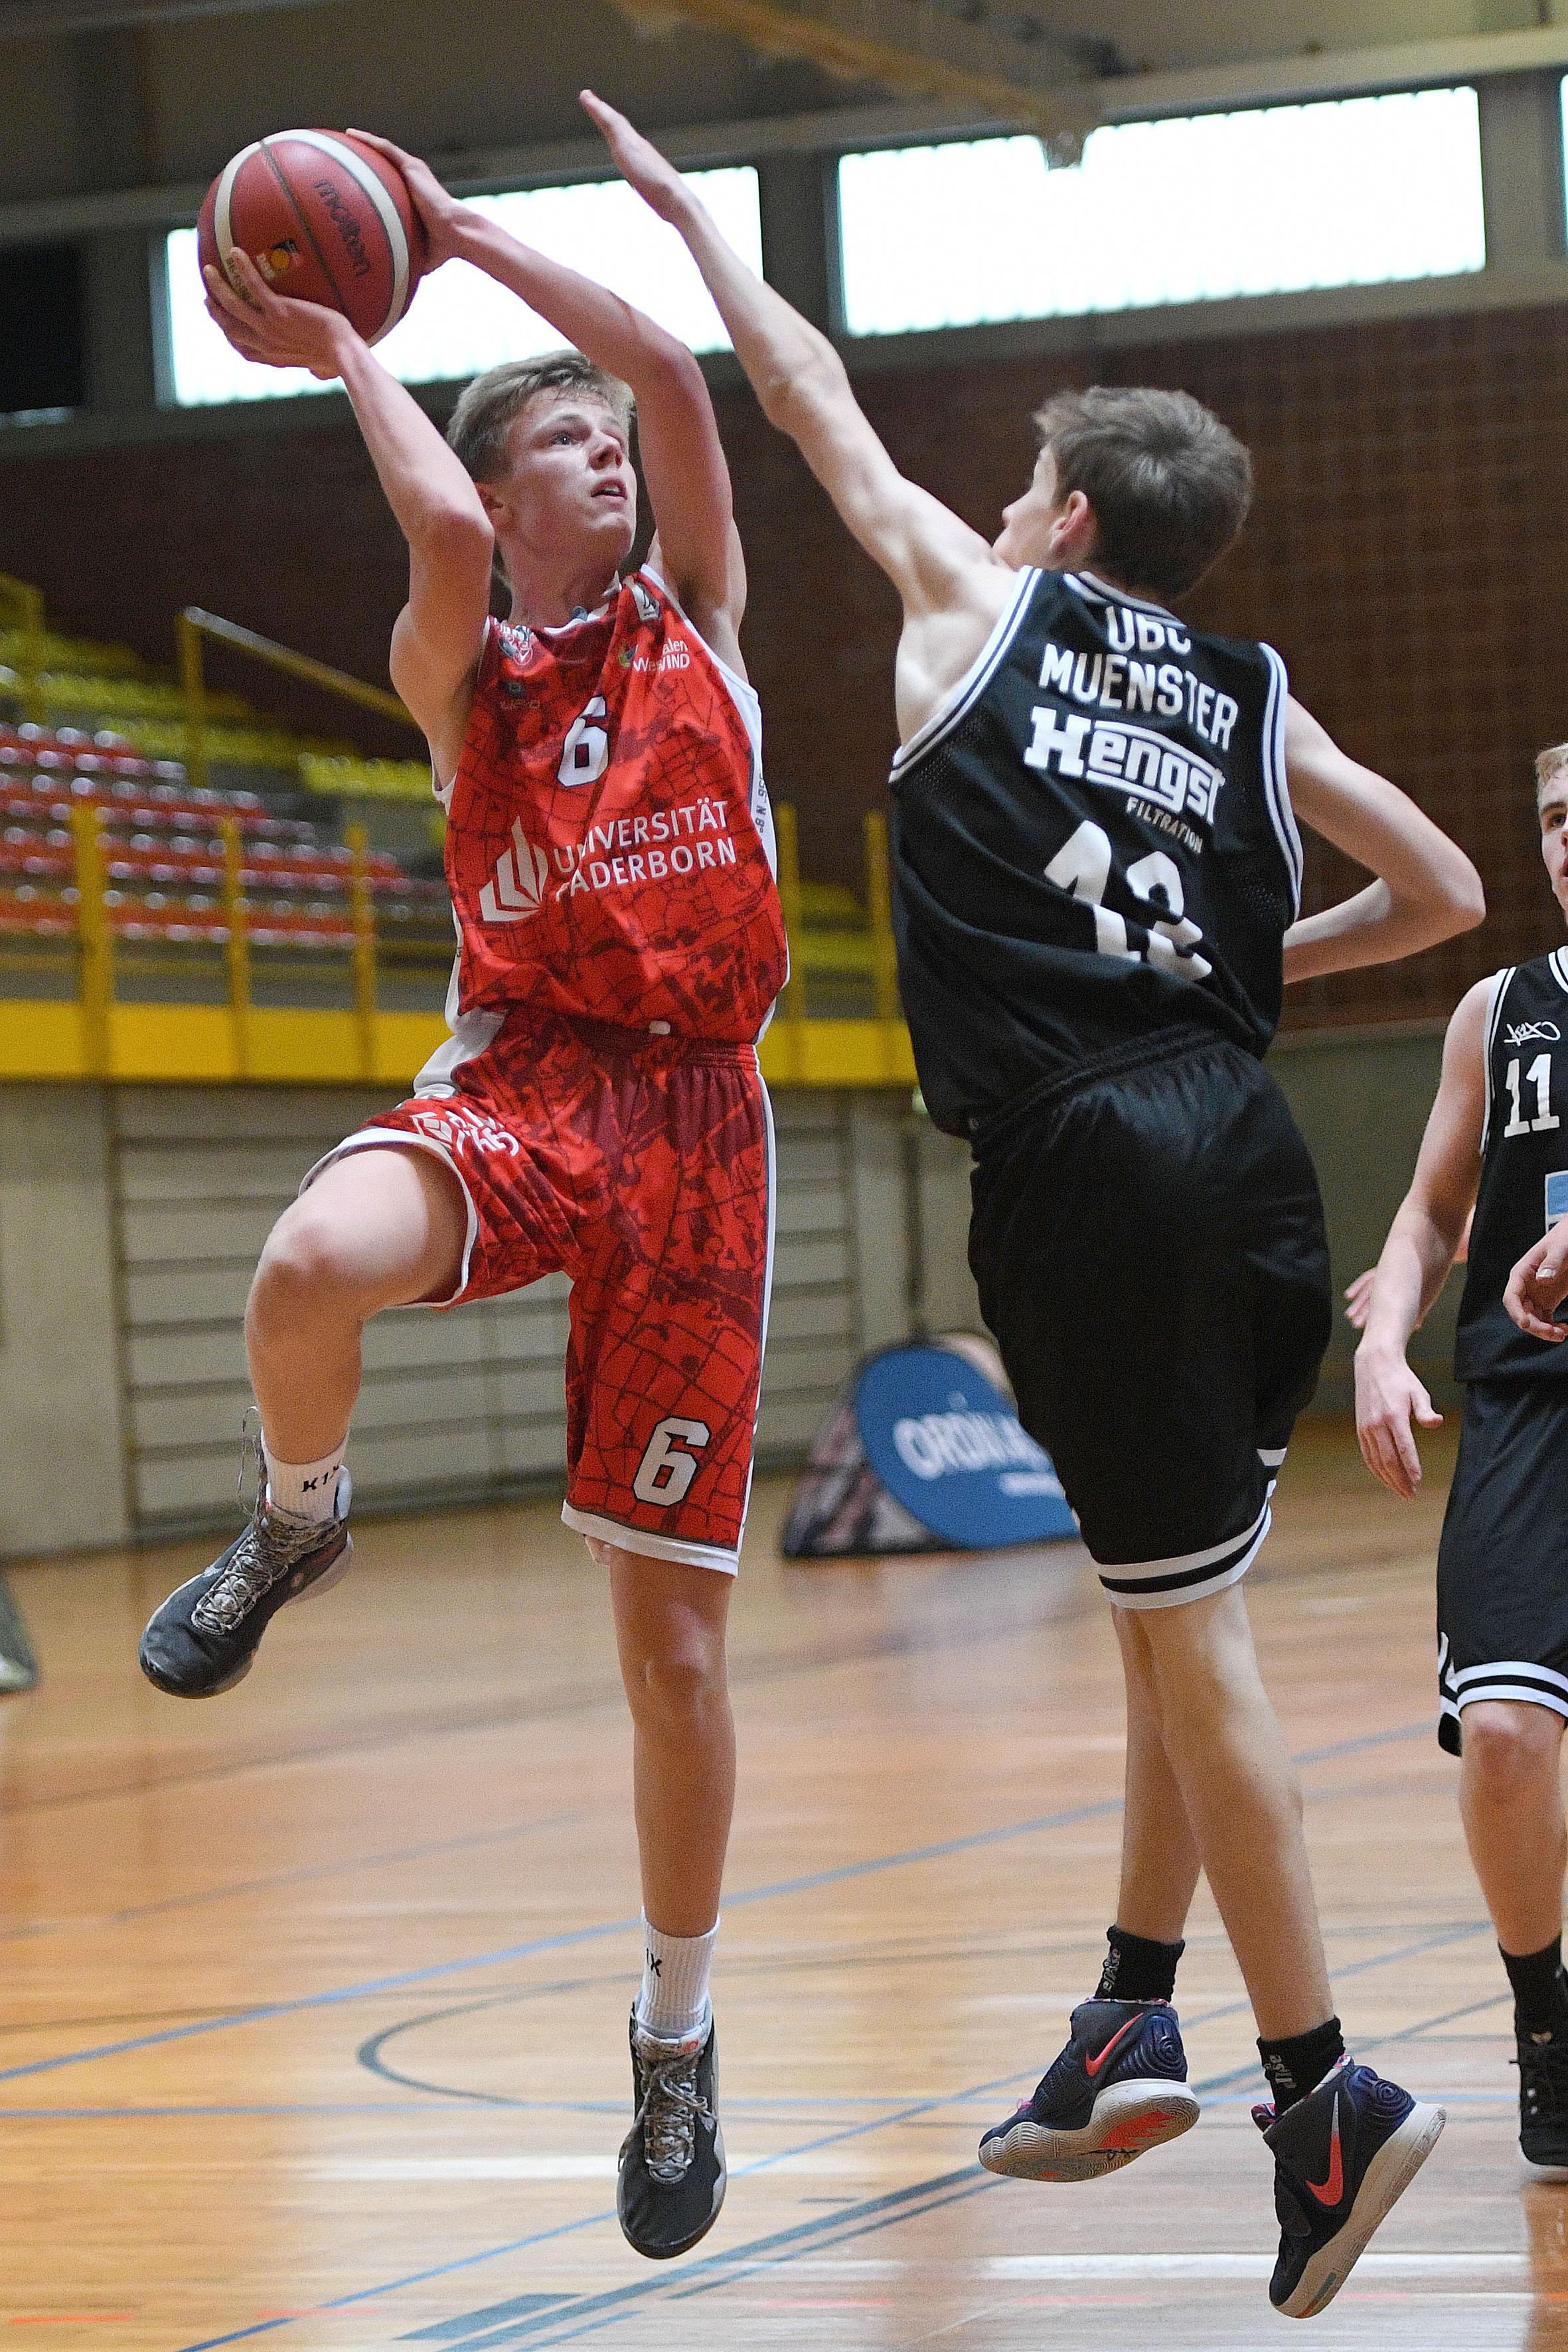 2020-10-18-JBBL-Uni-Baskets-Paderborn-UBC-Muenster_8294